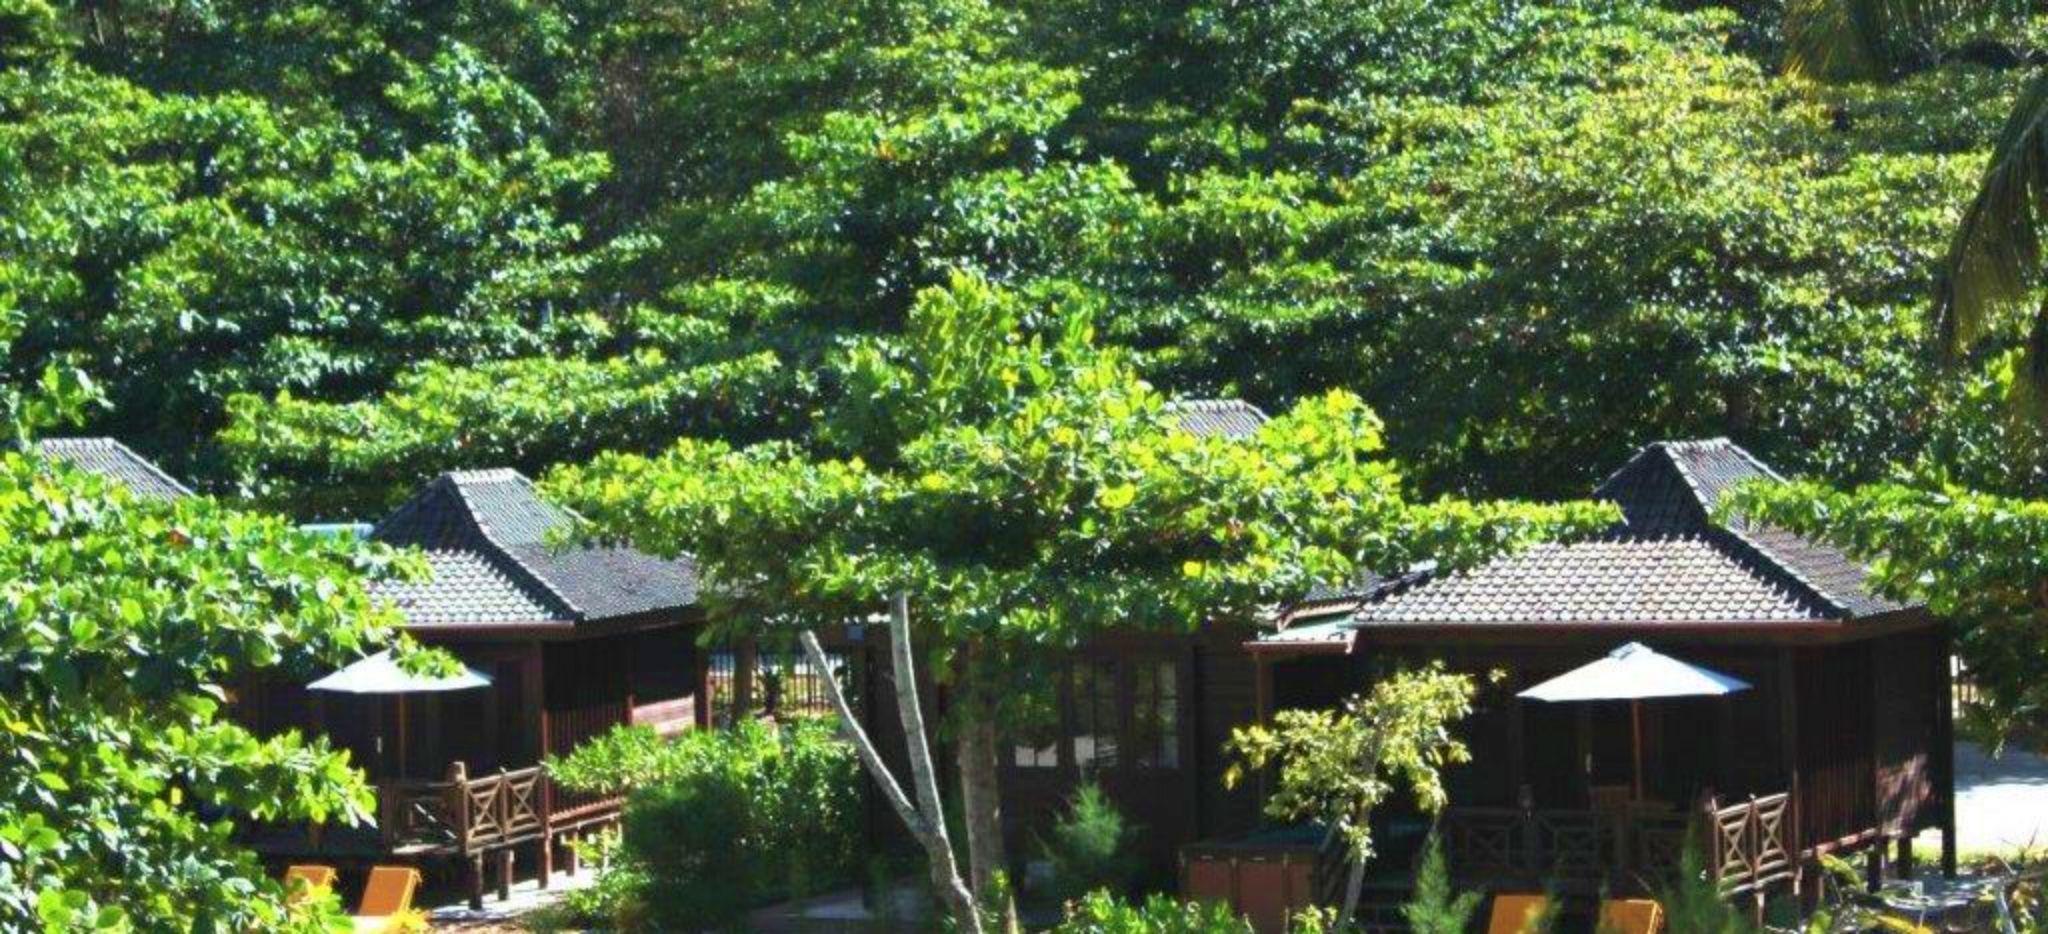 Zwei One Bedroom Villas im Dschungel